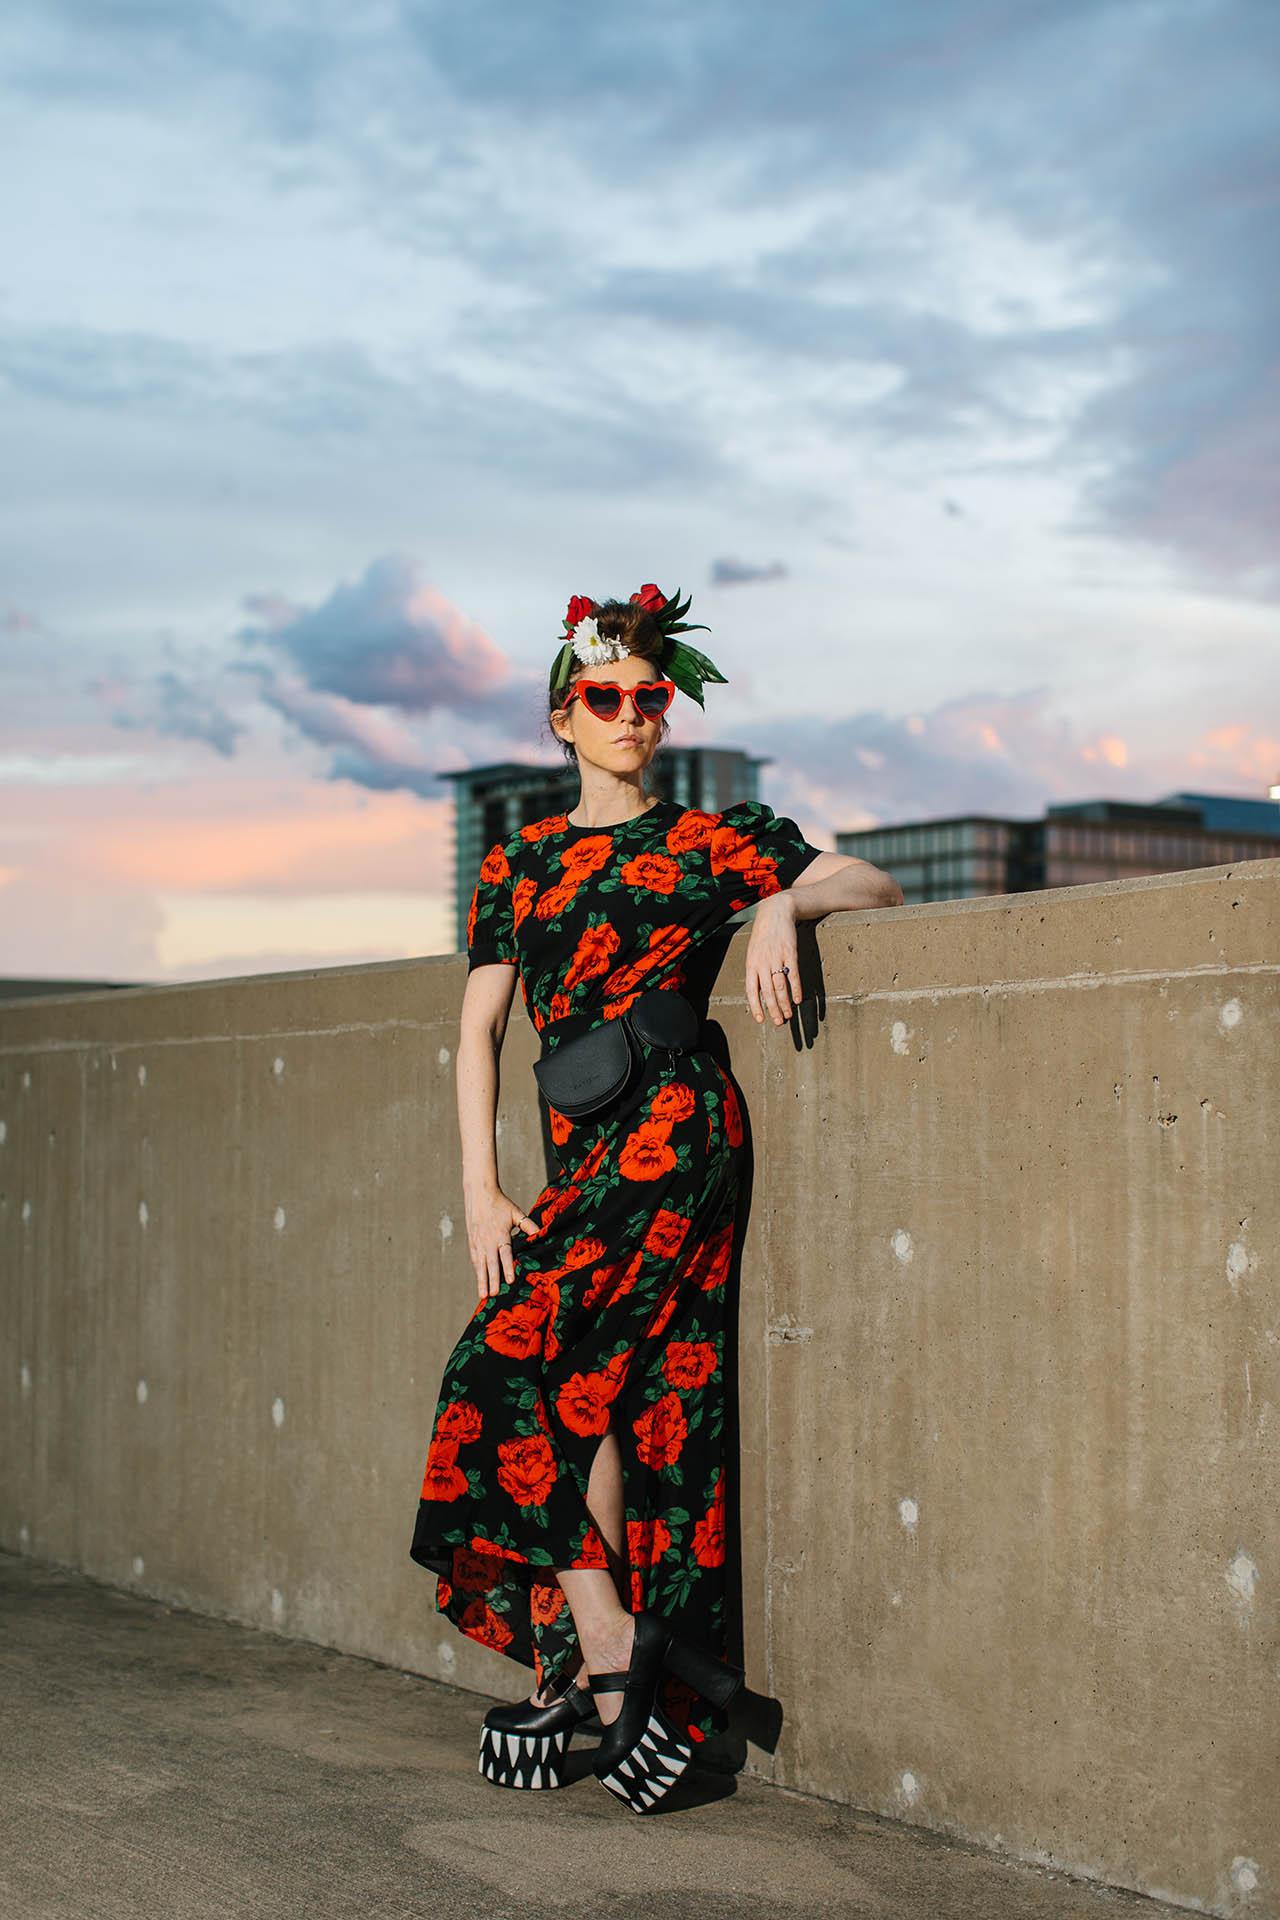 Fort Worth fashion photos